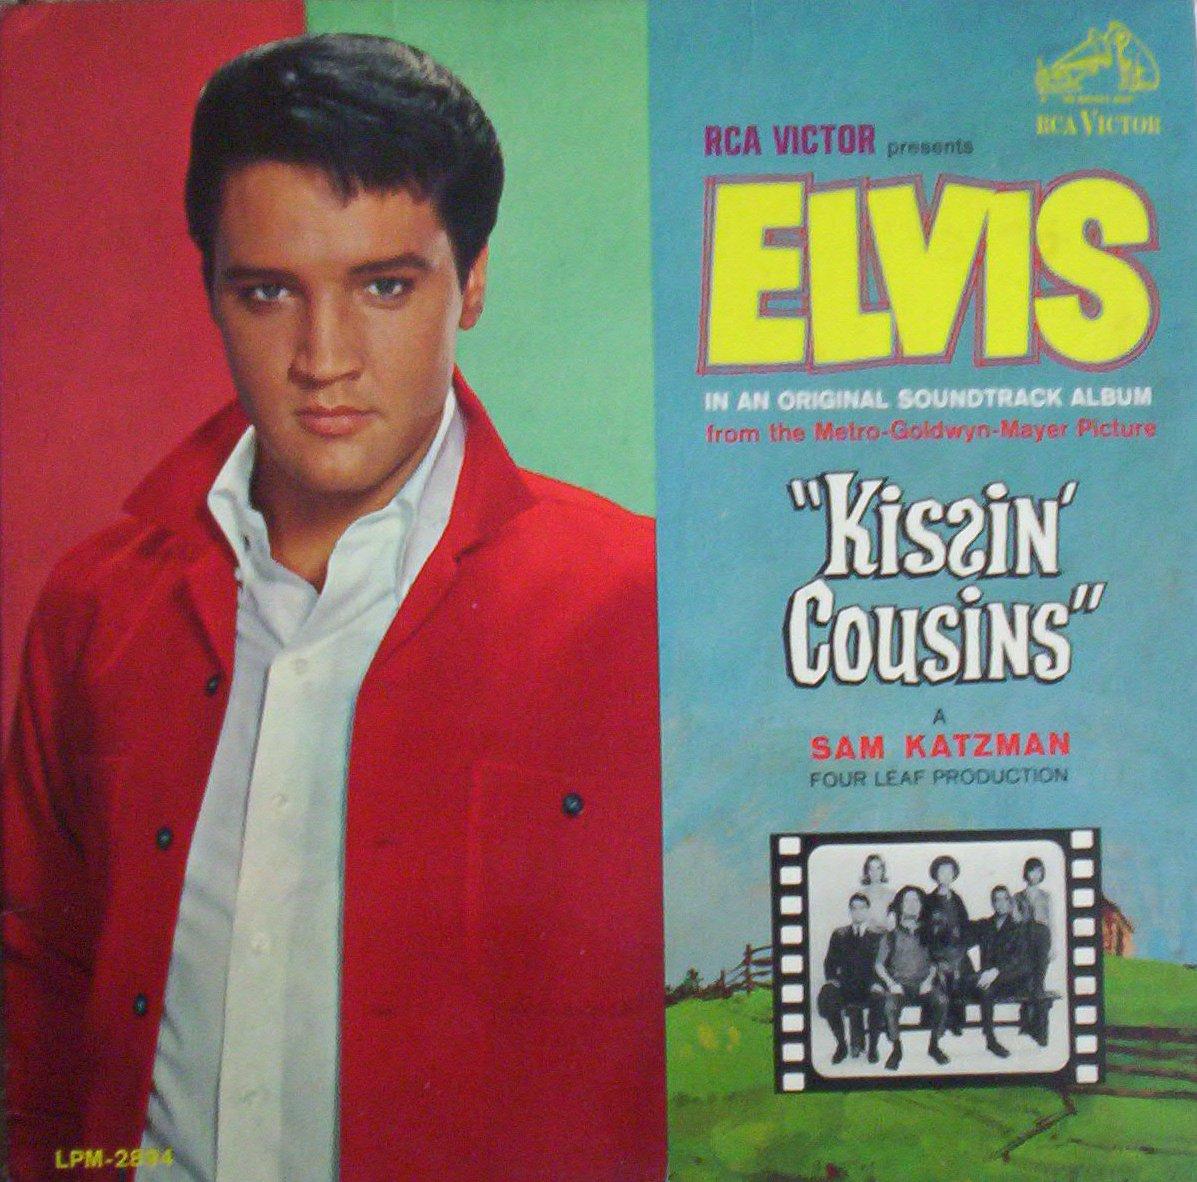 KISSIN' COUSINS 100_9629wrbbr